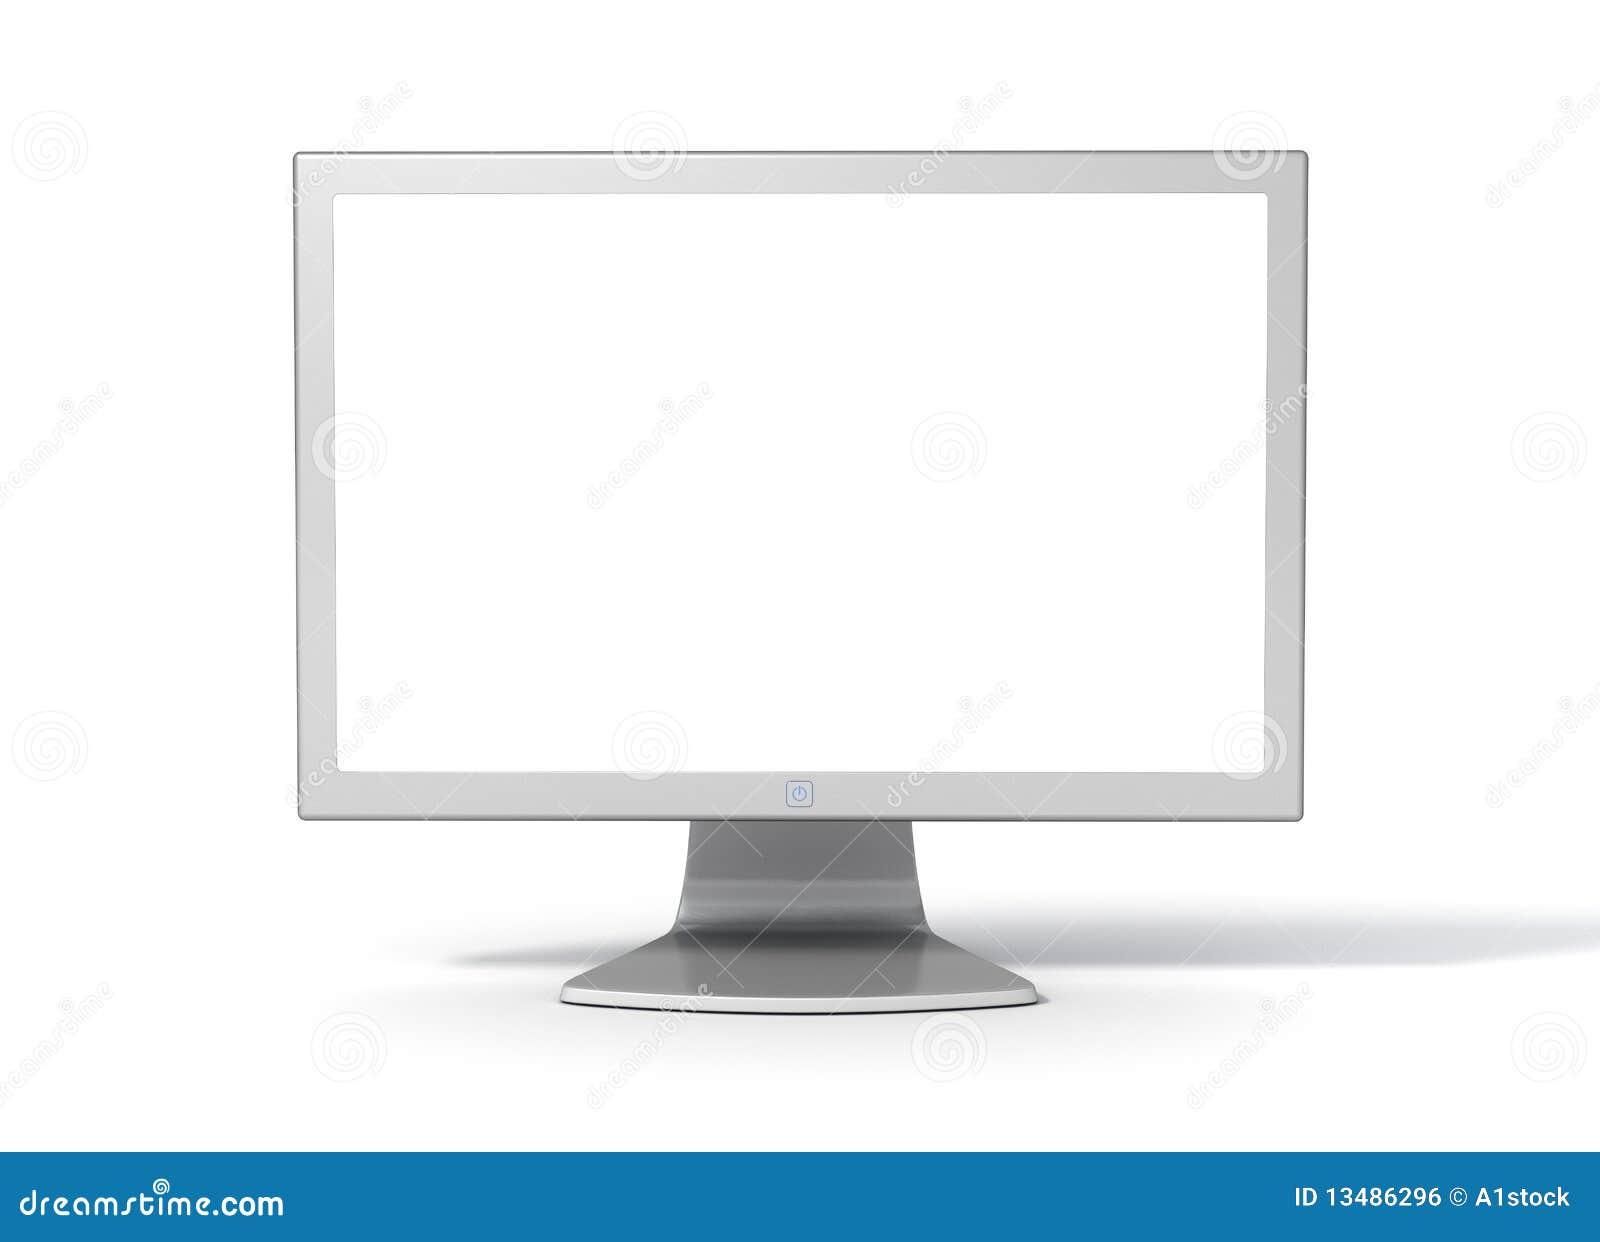 Royalty Free Stock Image  Desktop Computer Monitor - FrontDesktop Computer Monitor